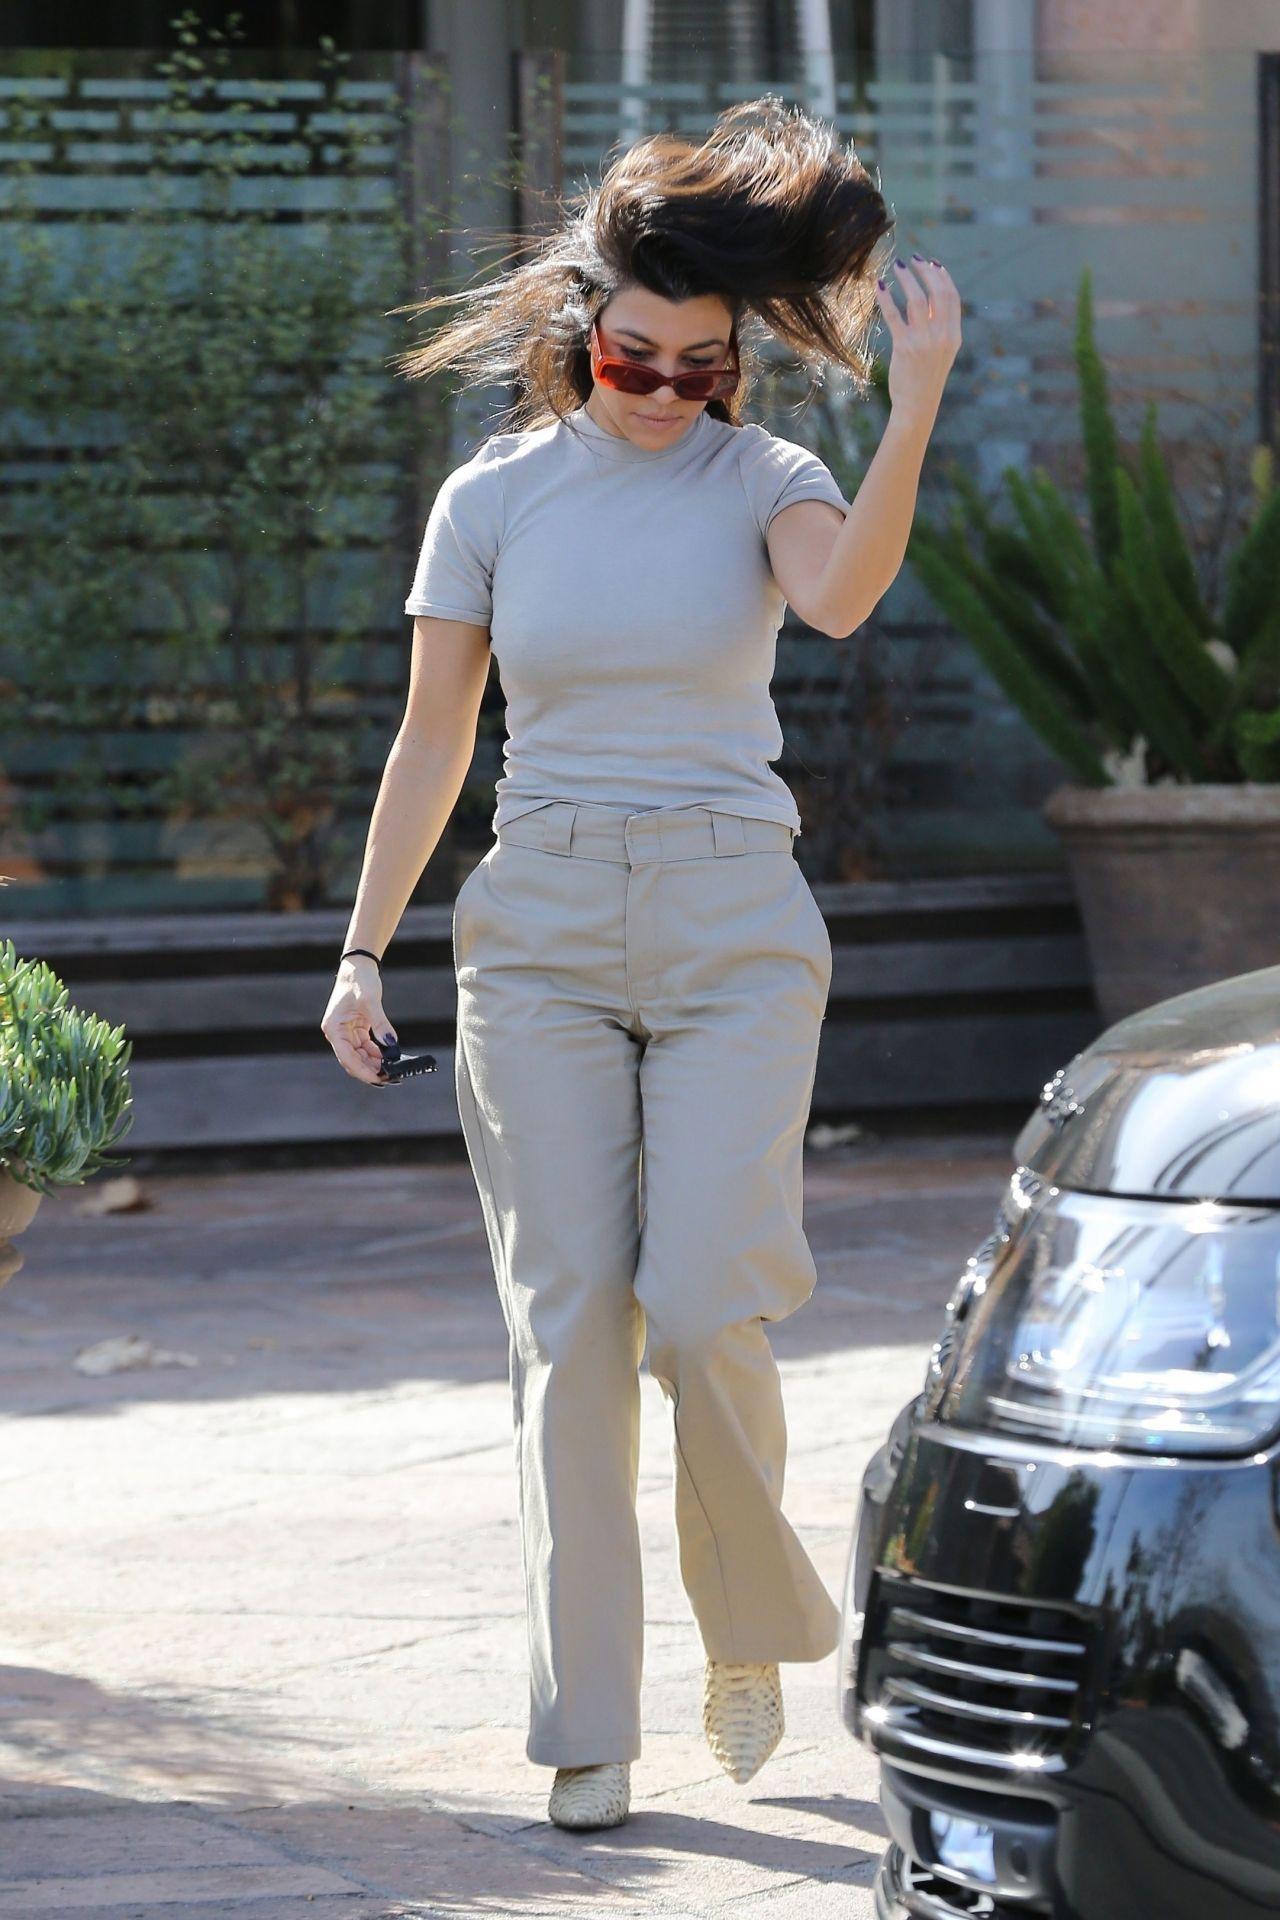 Kourtney Kardashian In Chic Outfit 01 27 2019